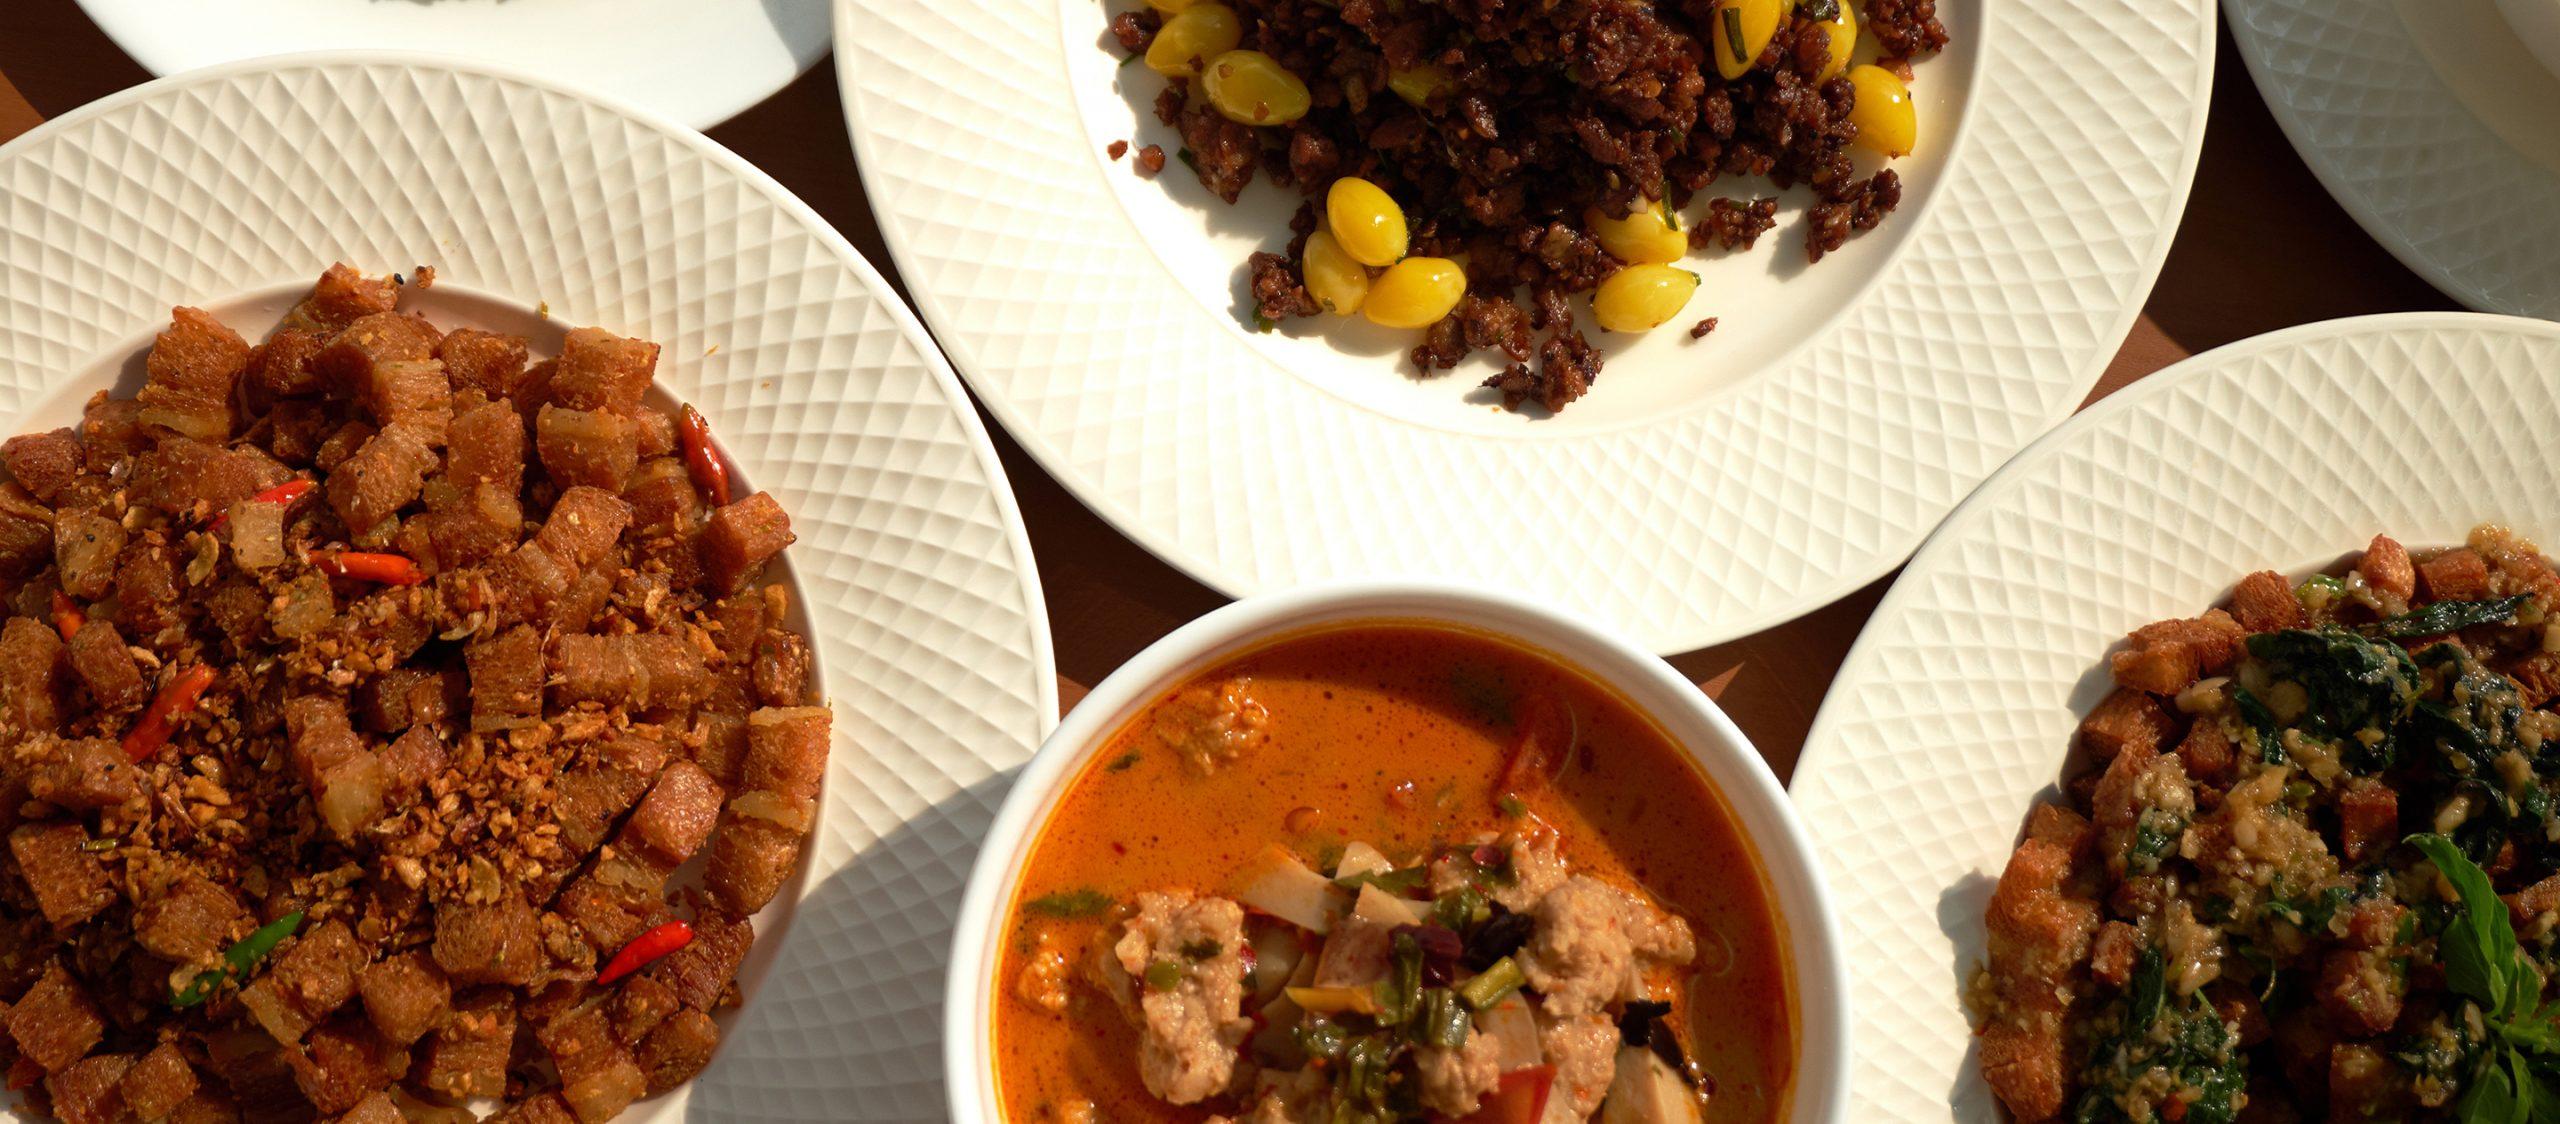 Meat Avatar แบรนด์ที่อยากให้คนไทยได้กินเนื้อจำแลงจากพืชผักในราคาไม่แพง